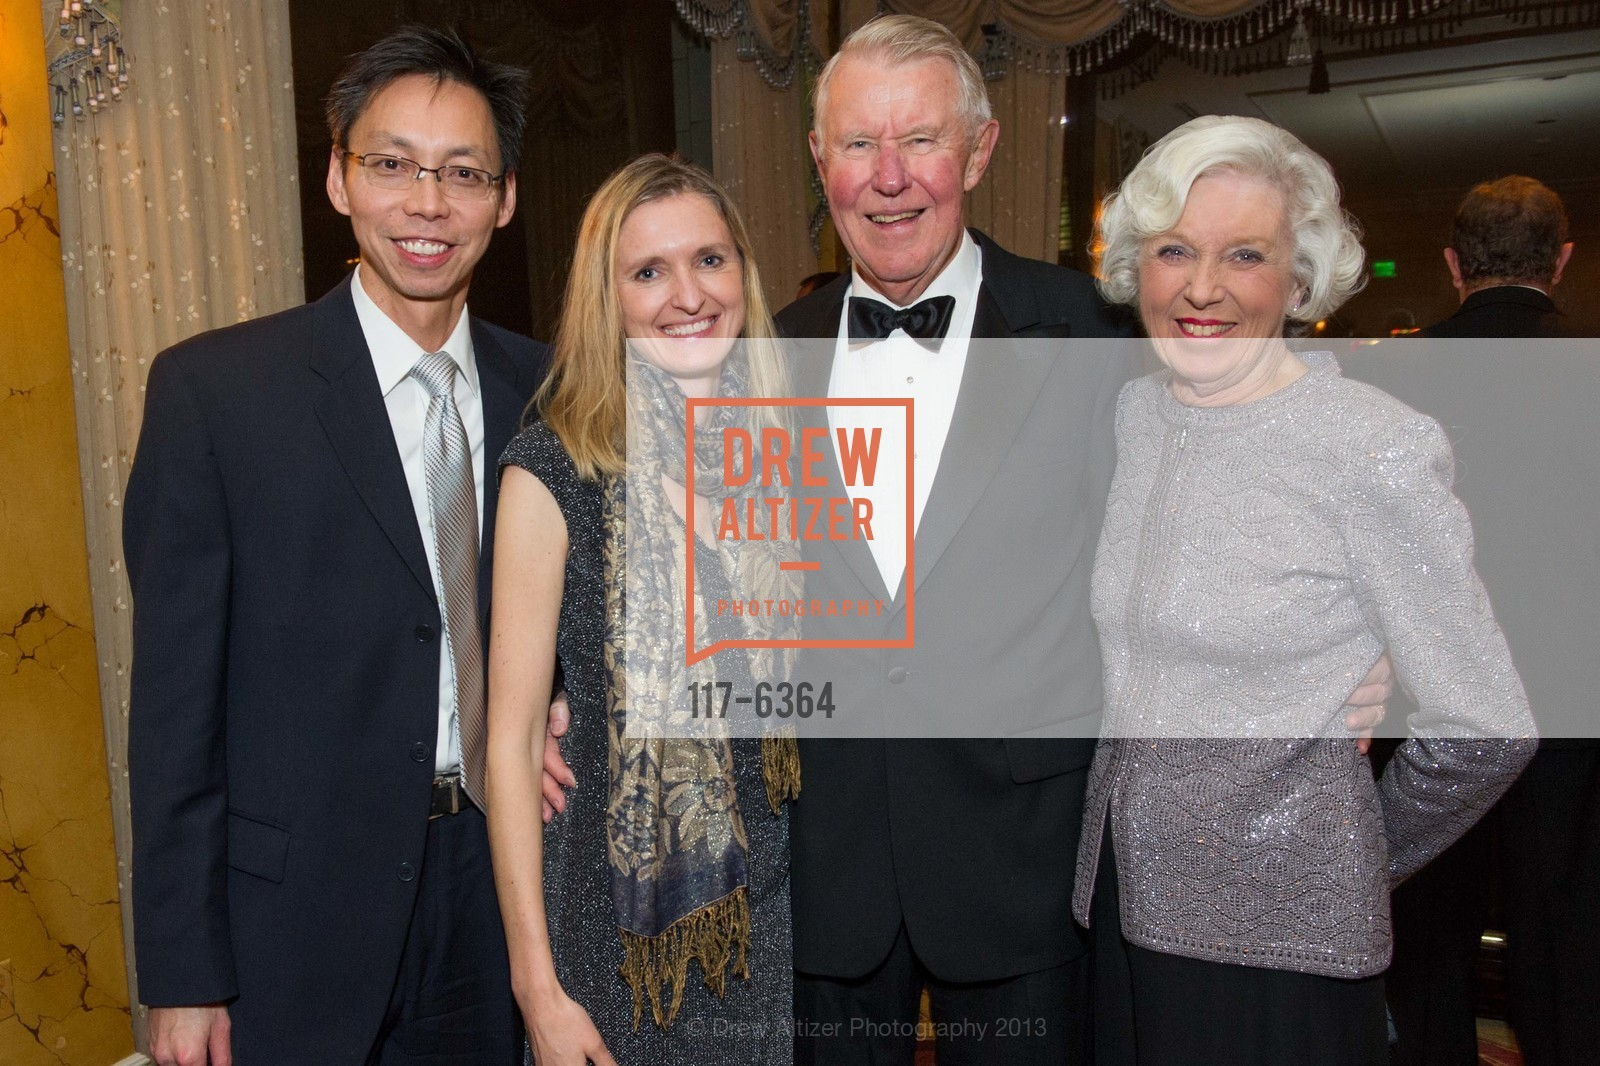 Peter Teng, Marzena Jurek, Norm Wallin, Katherine Wallin, 25th Anniversary Holiday HOB NOB ON THE HILL, US, December 6th, 2013